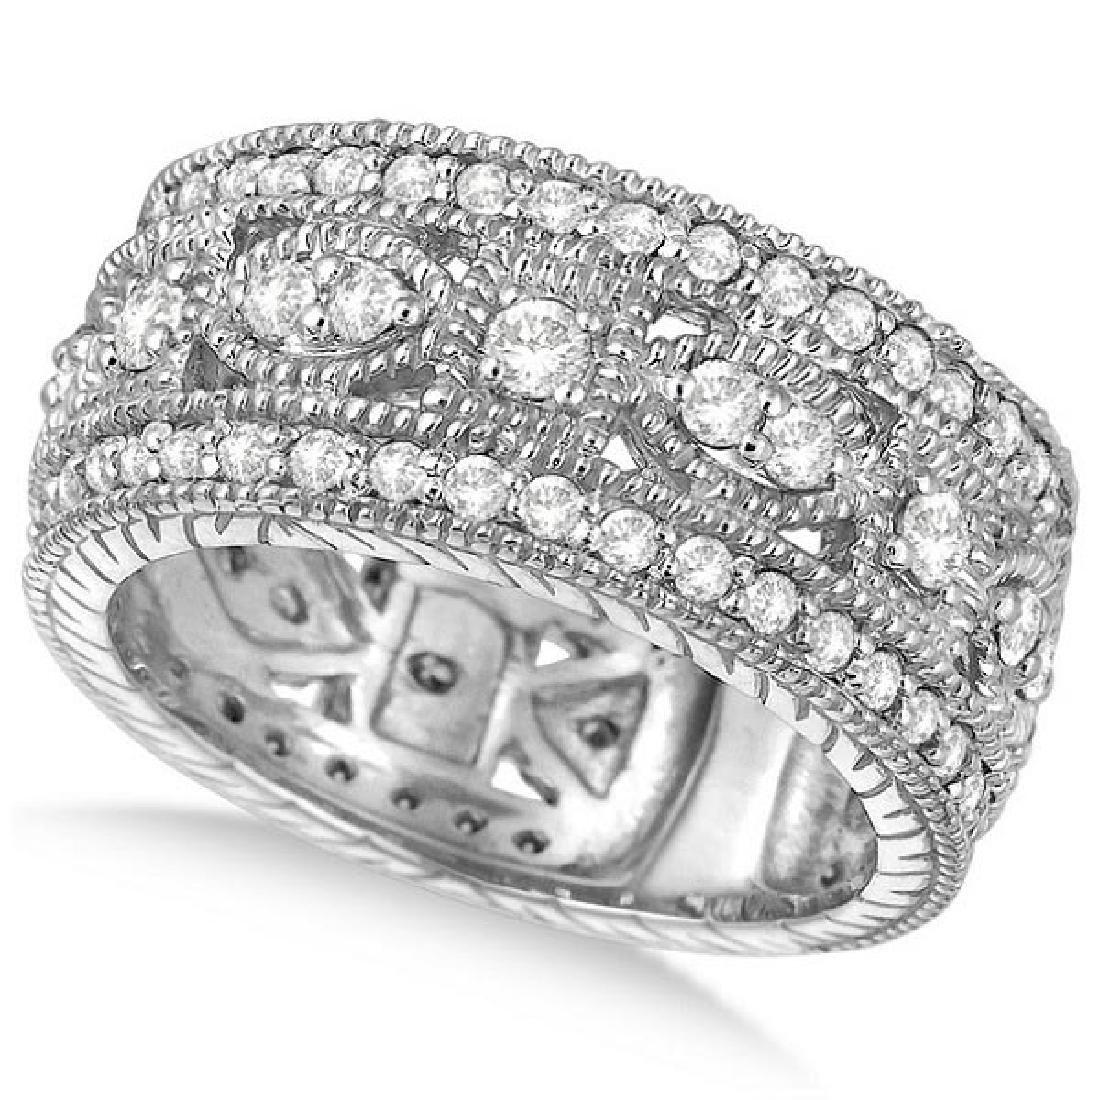 Vintage Style Byzantine Wide Band Diamond Ring 14k Whit